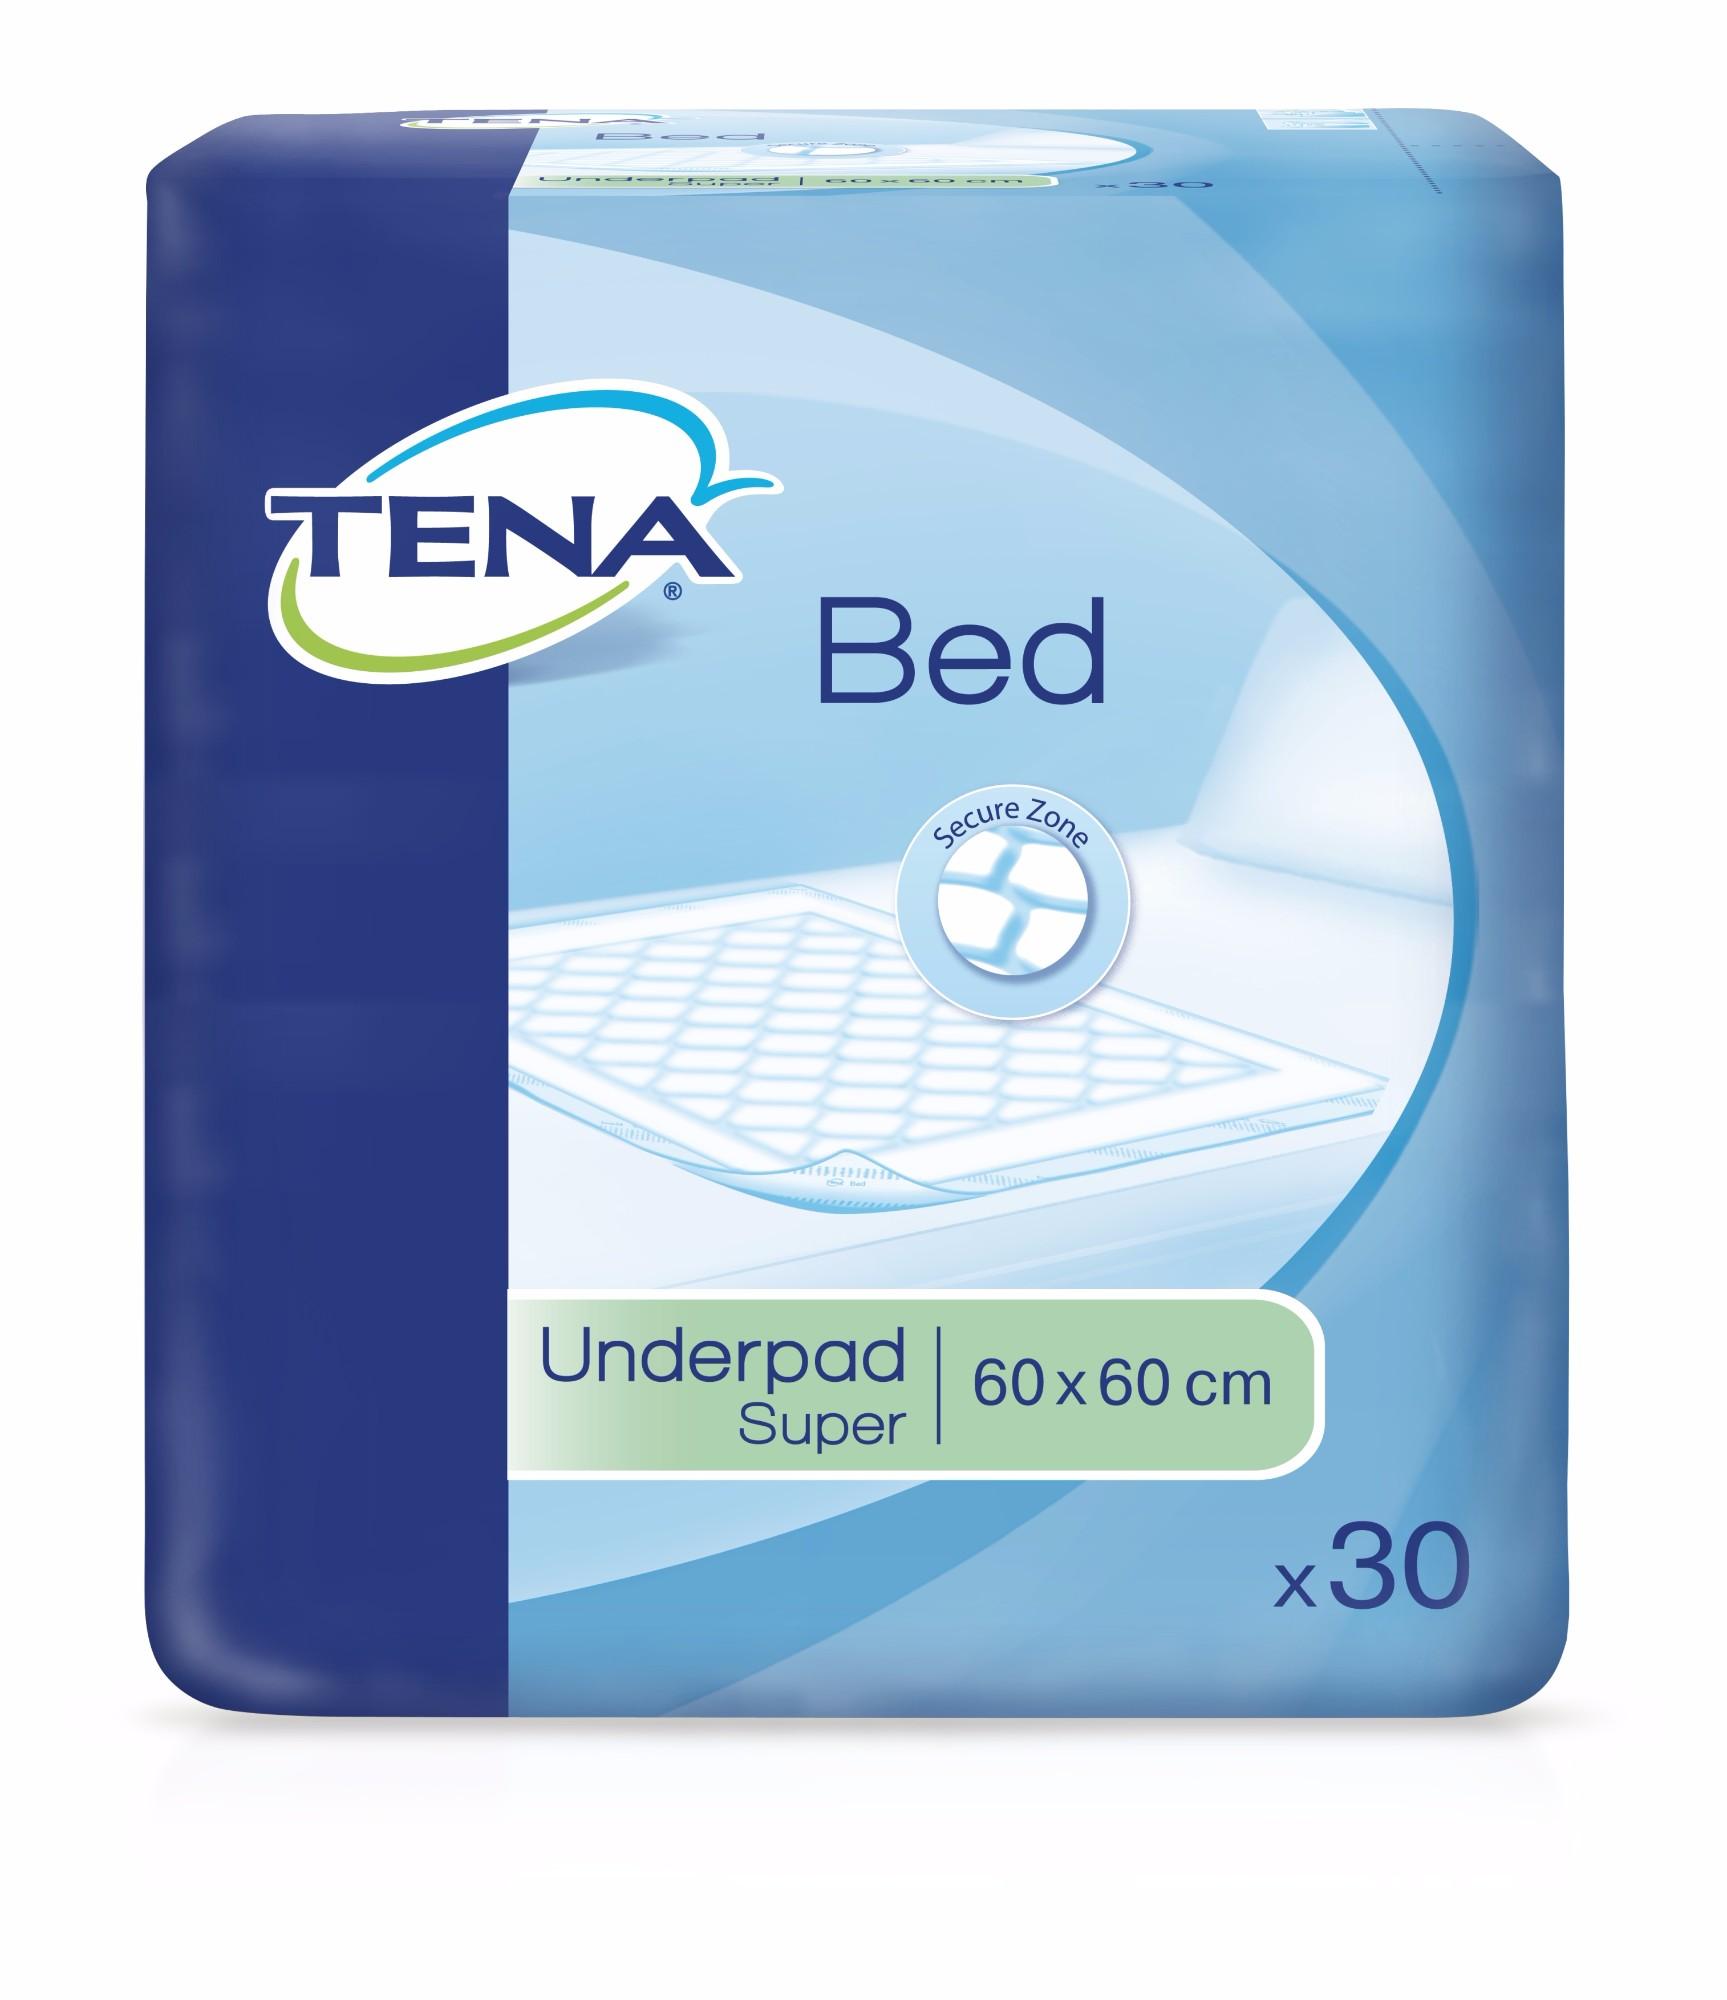 Tena Bed Plus Secure Zone paklotai 60x60cm, 30 vnt